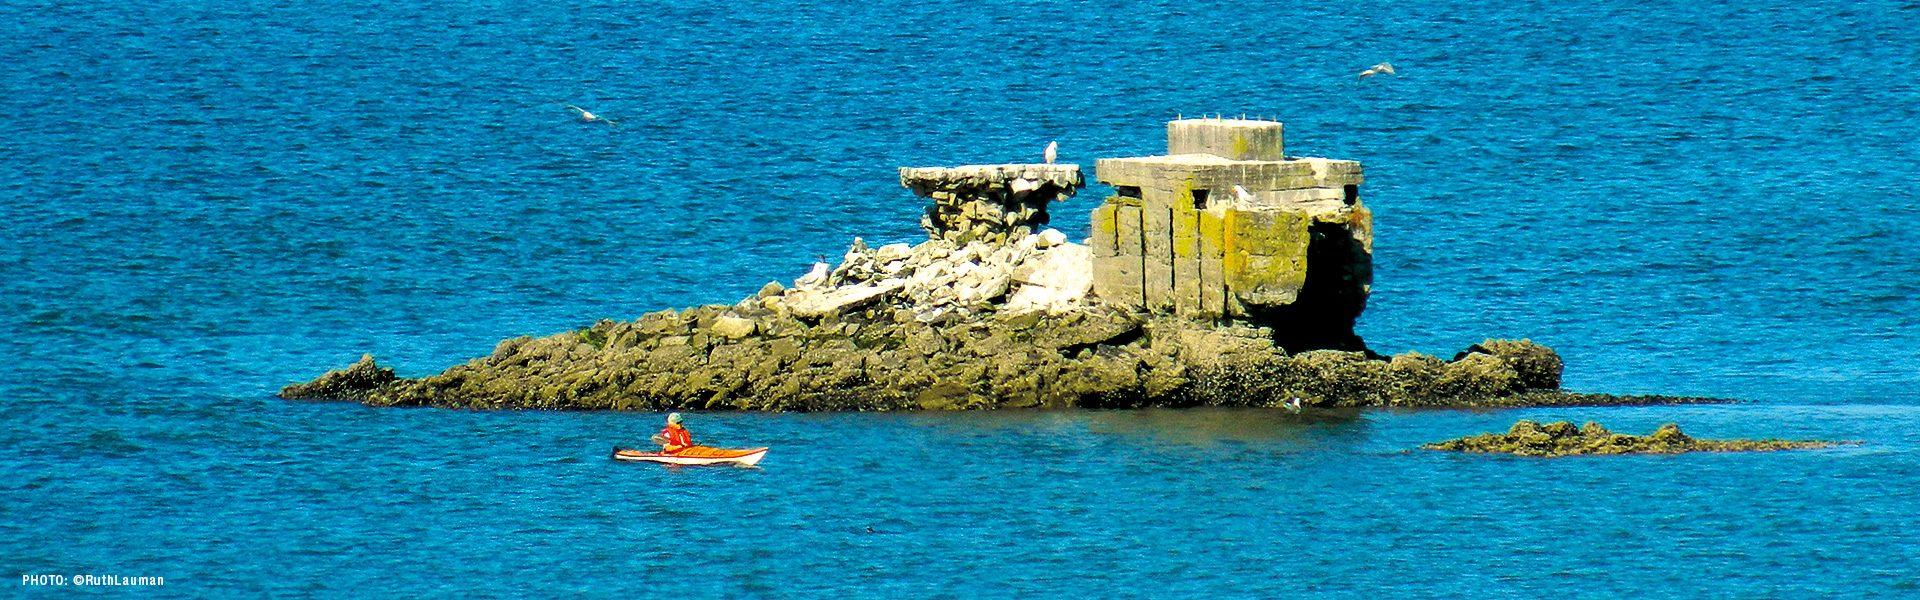 Kayaking Blaine's Drayton Harbor